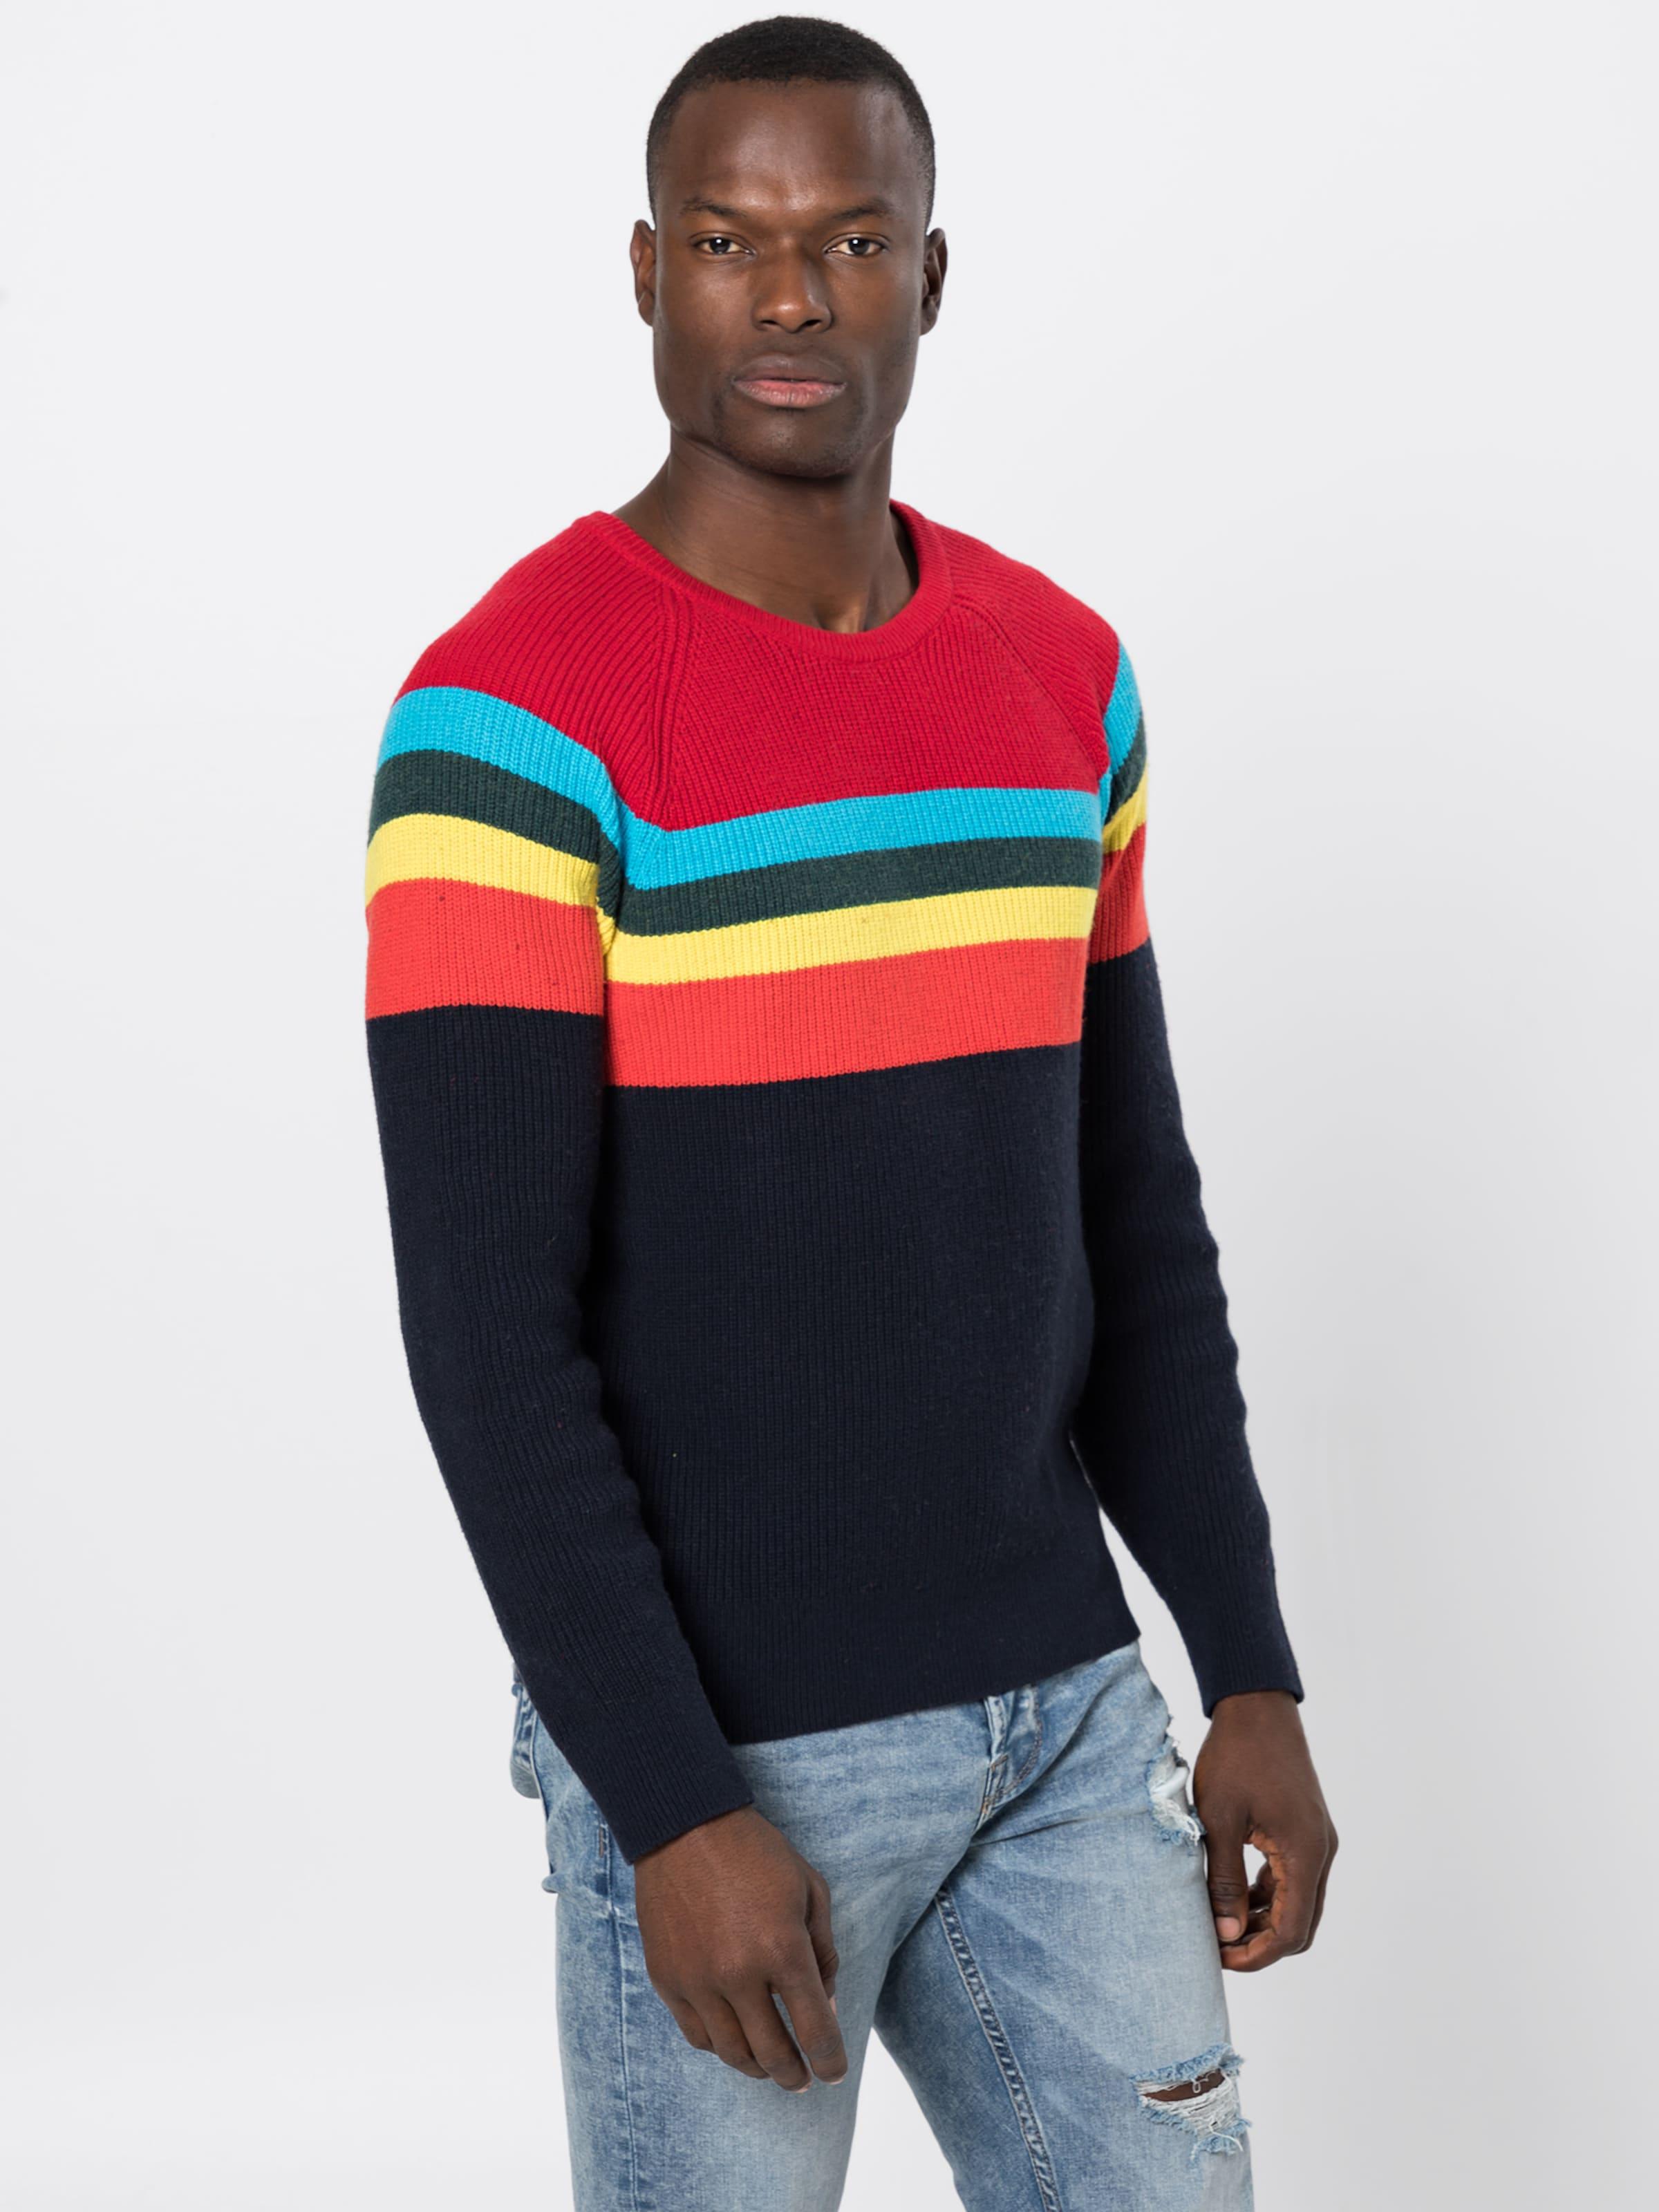 Gap In BlauGelb Rot Schwarz Pullover HEDI29